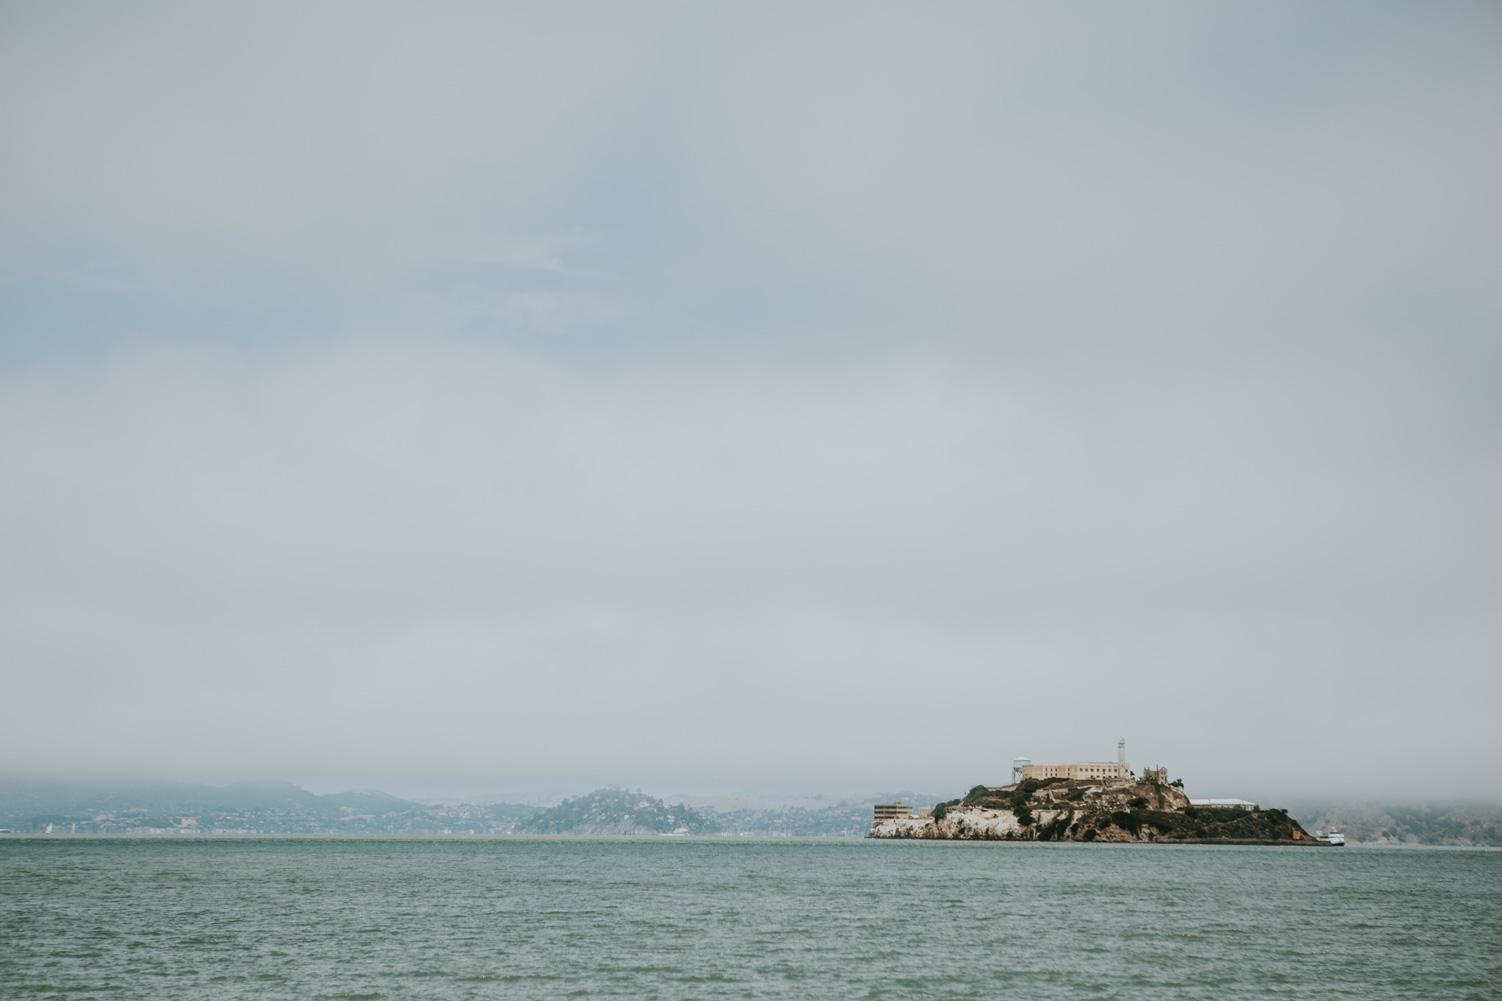 CindyGiovagnoli_SantCruz_SanJose_SanFrancisco_NelderGrove_sea_lions_boardwalk_hapas_brewery_sourdough_ocean_half_moon_bay_California-099.jpg